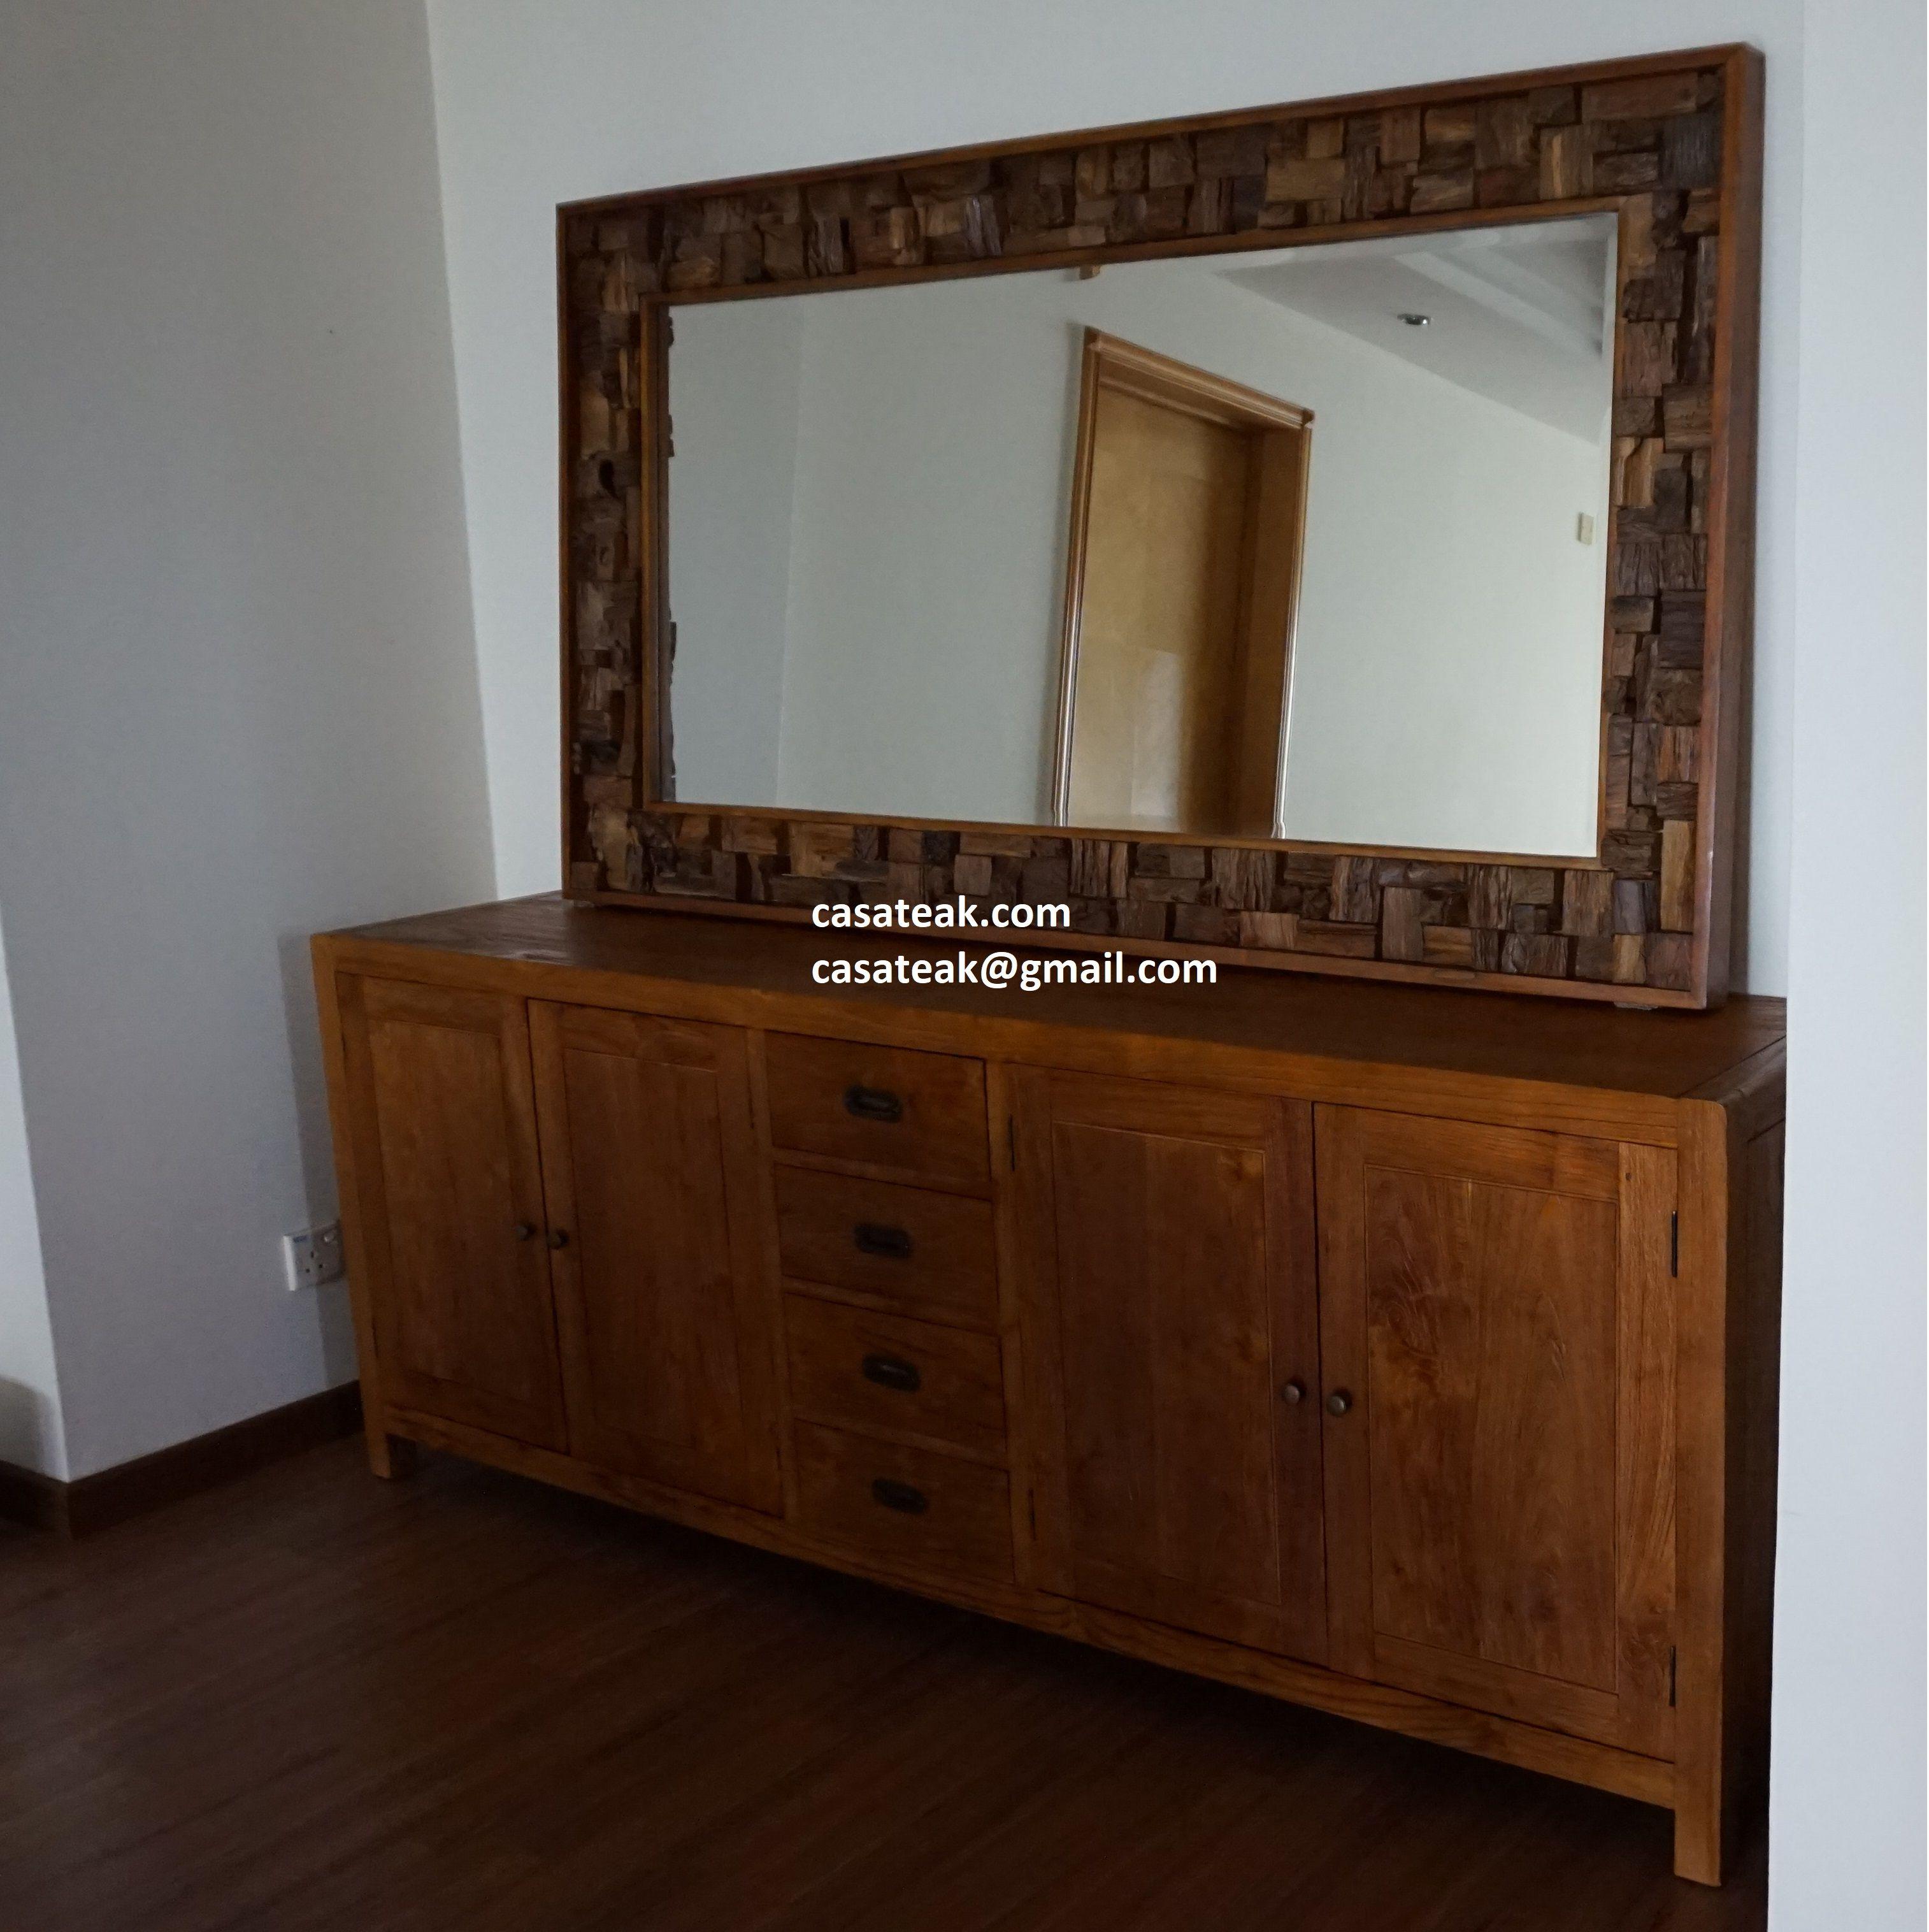 JB Sideboard SB 15-12 in 2019 | Teak furniture, Teak wood ...